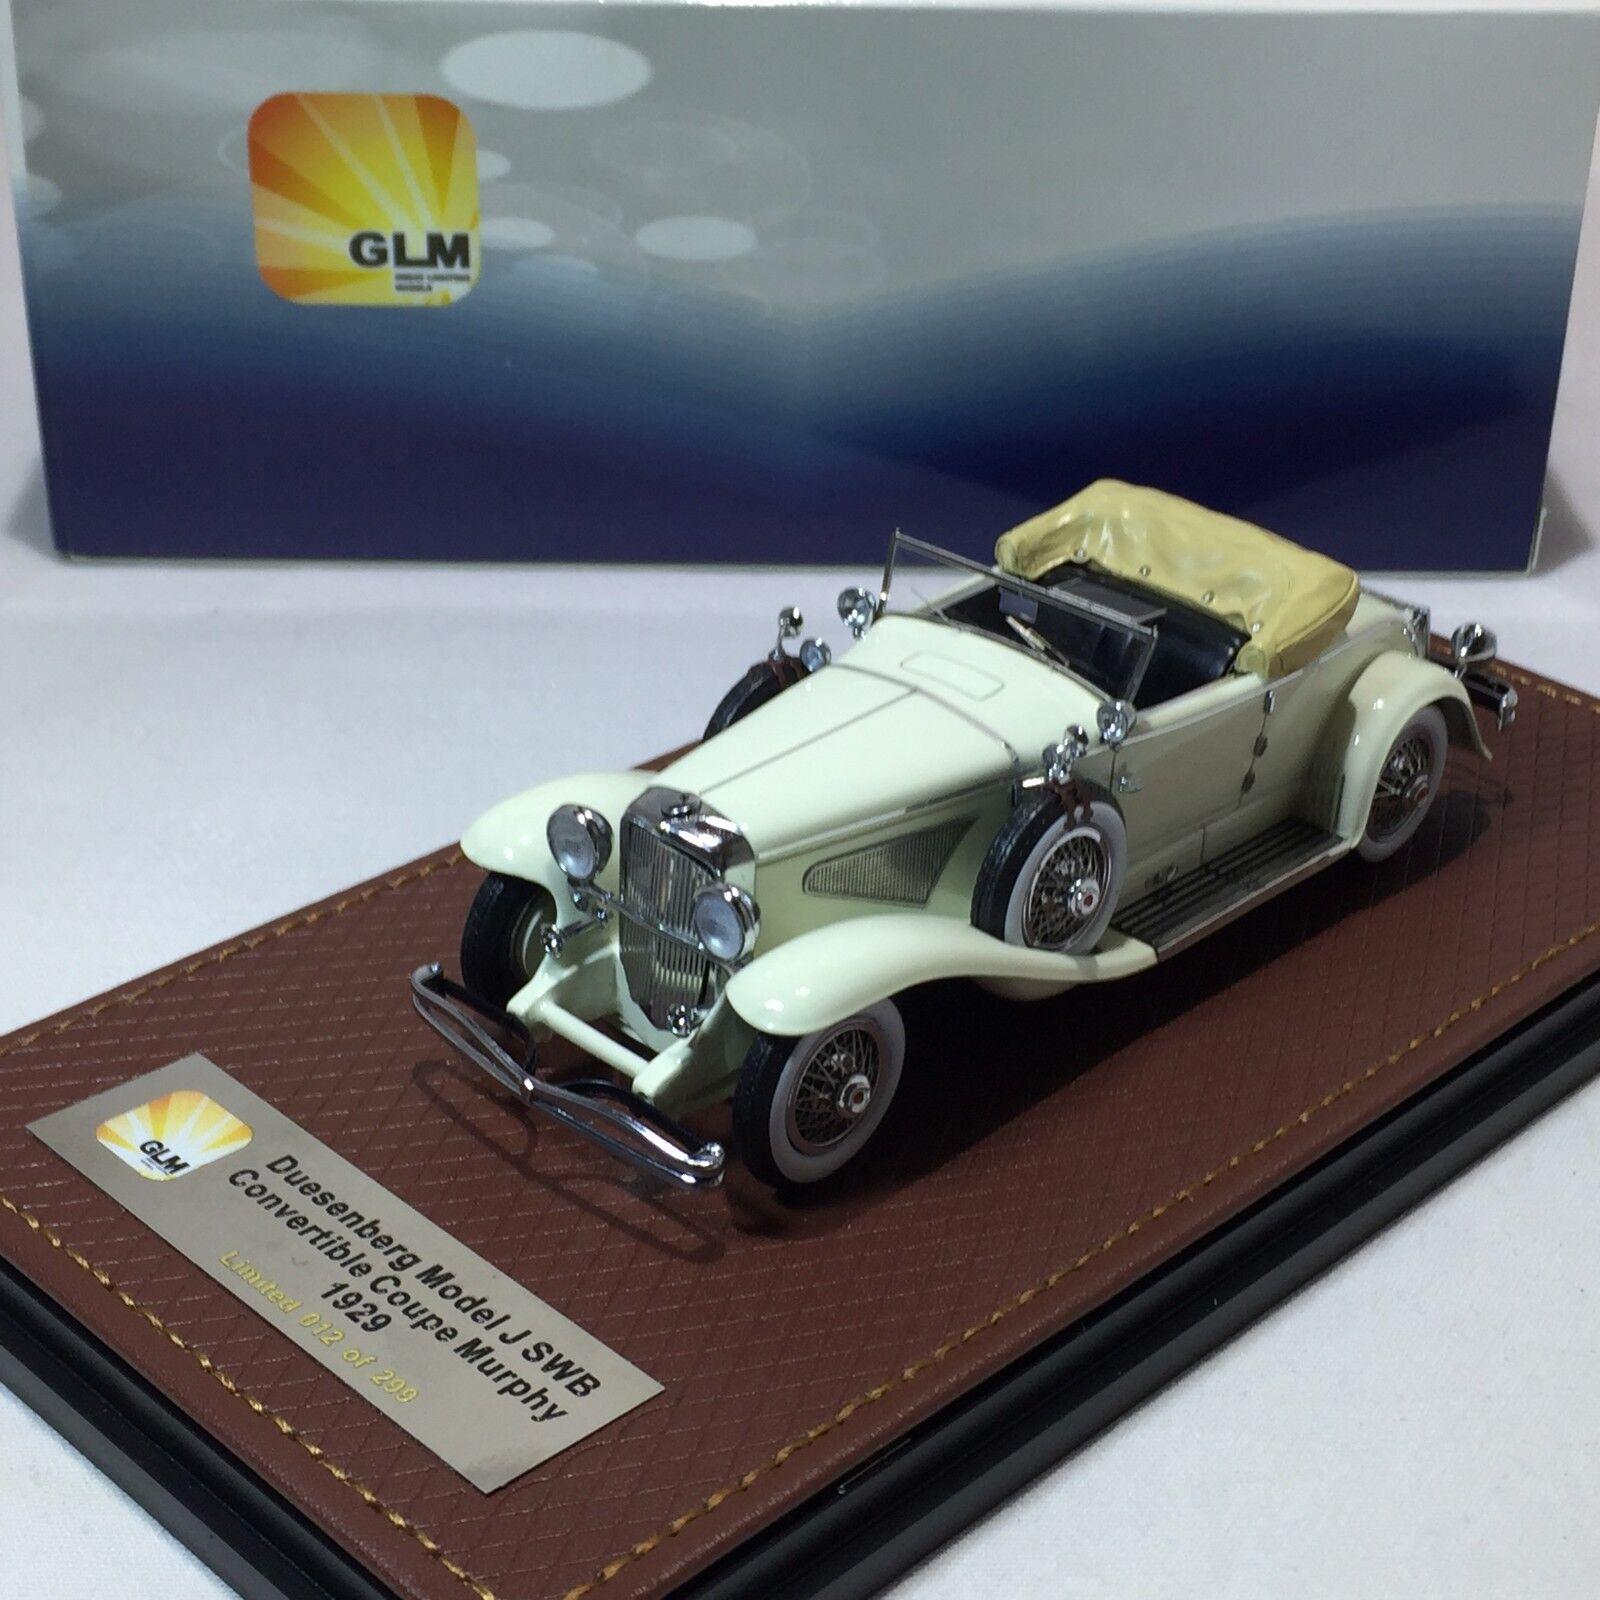 1 43 Modelo GLM Duesenberg J SWB Converdeible Coupe 1929 GLM151001 Morphy